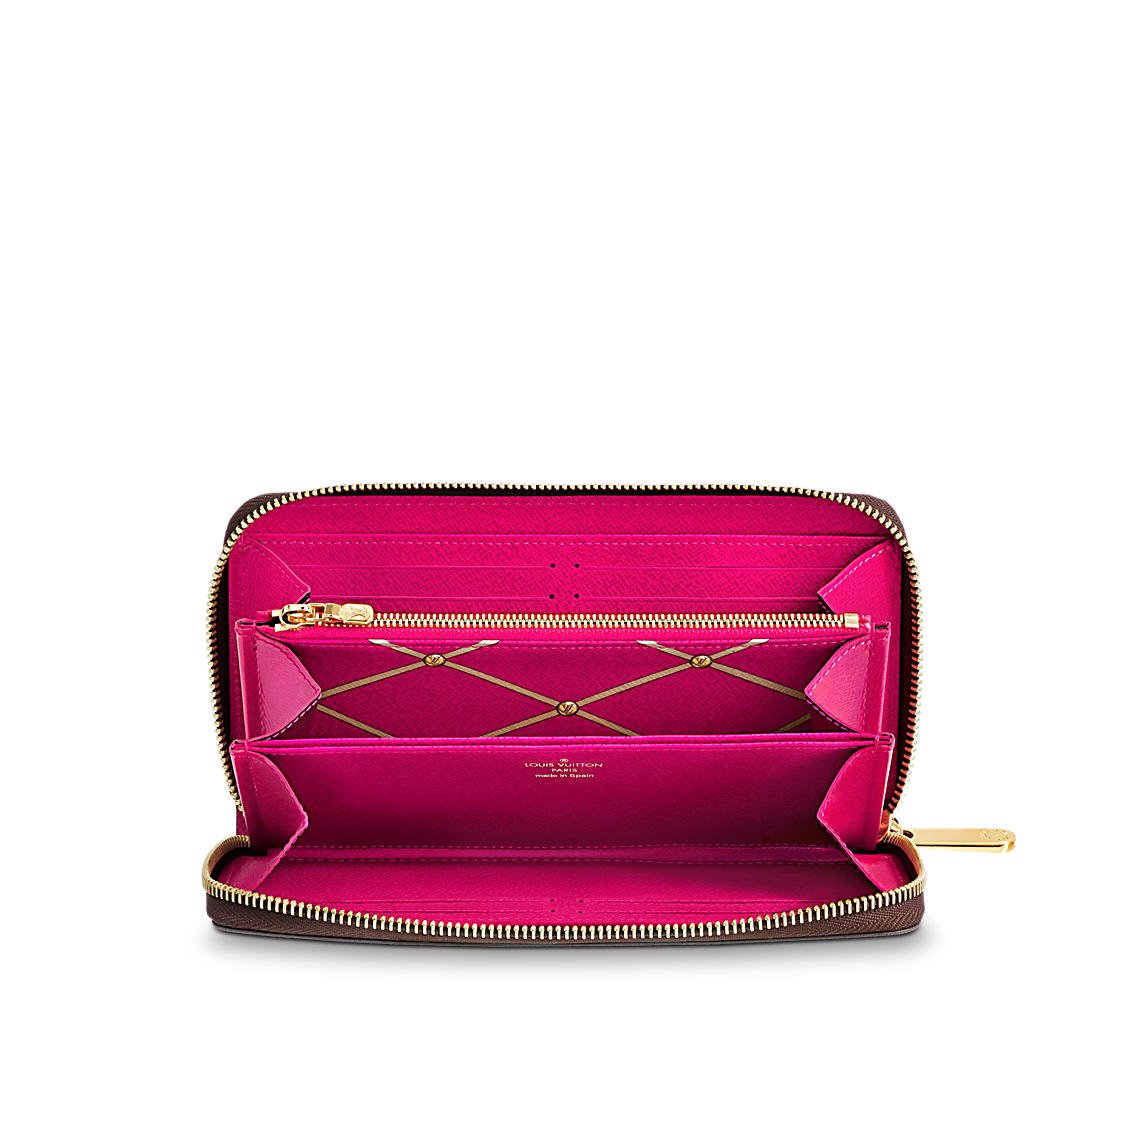 e645e912a27 Louis Vuitton Monogram Zippy Wallet Summer Trunk M62616 at Amazon Women s  Clothing store